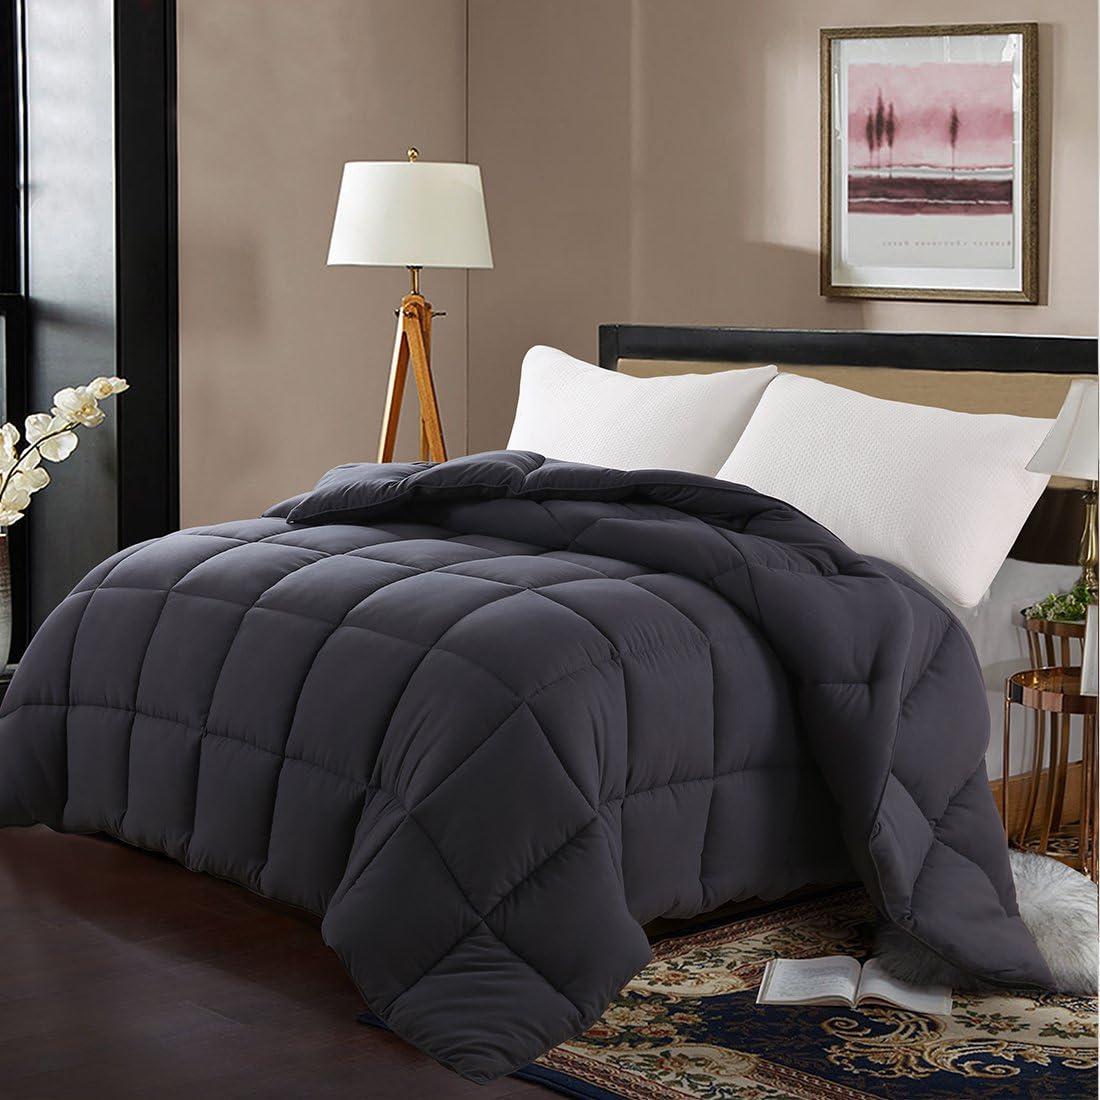 EDILLY Luxury Down Alternative Quilted Queen Comforter-Stand Alone Comforter for Queen Size Bed,Year Round Duvet Insert with 4 Corner Tabs,88''x 88'',Dark Grey